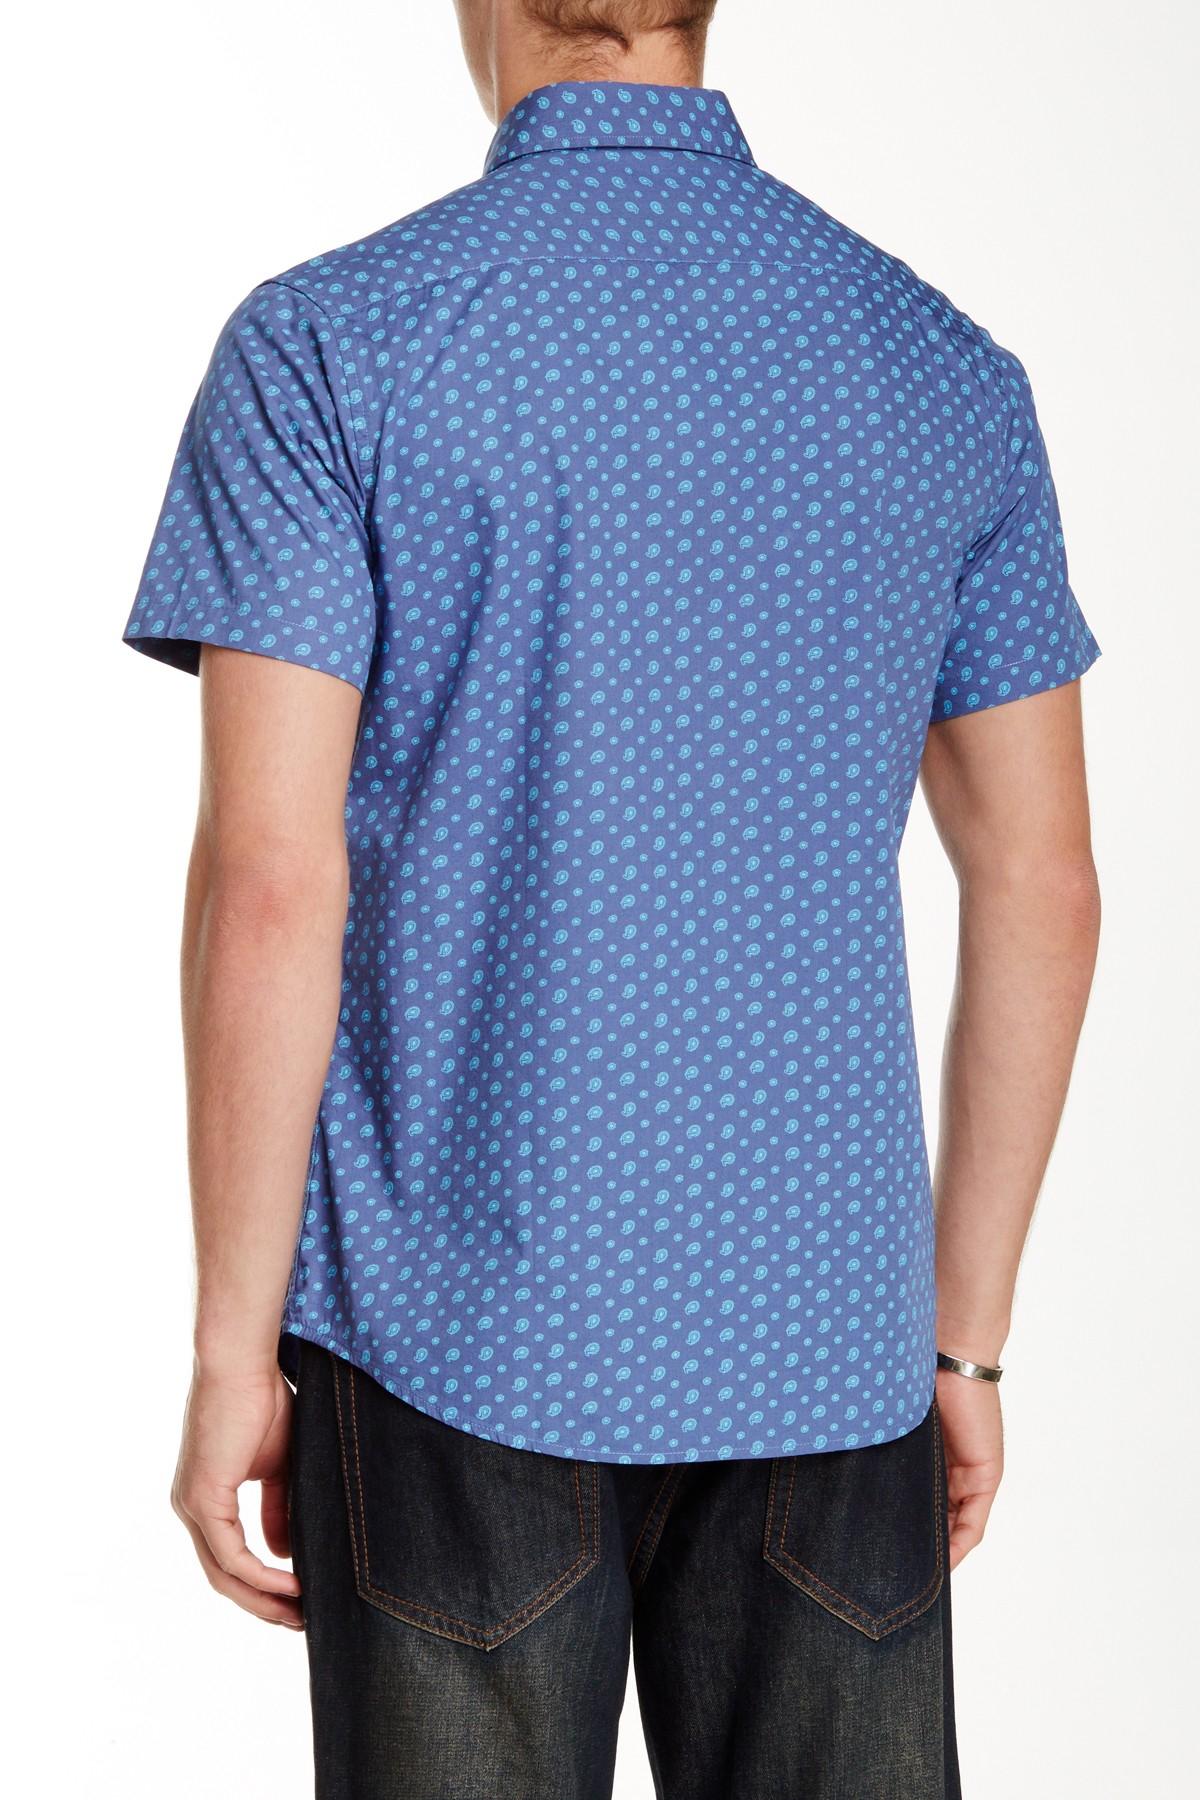 Slate And Stone Clothing : Slate stone slim fit paisley print short sleeve sport